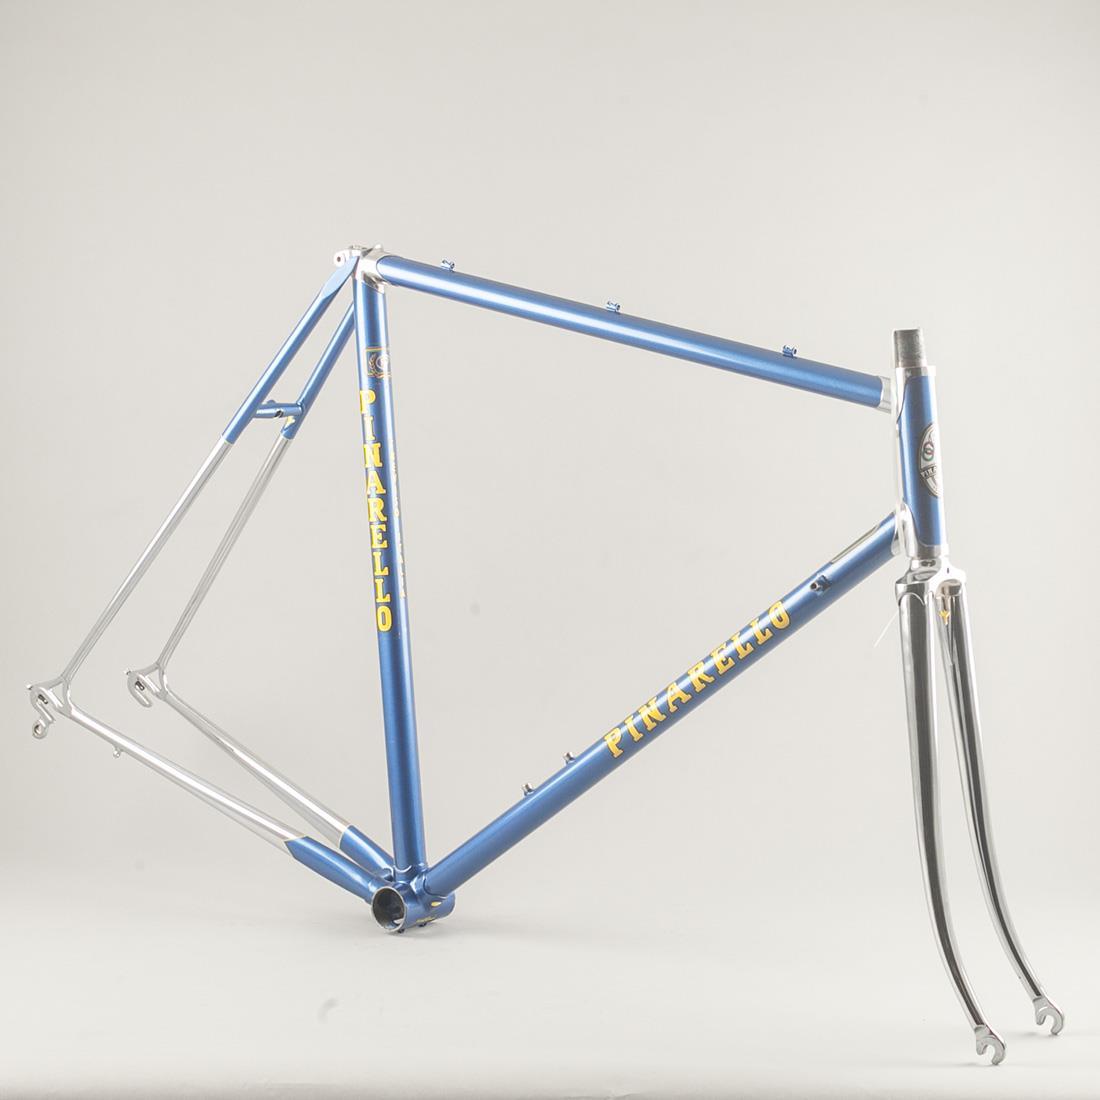 Usado Años 80 Pinarello especial restaurado Acero Bicicleta de ...